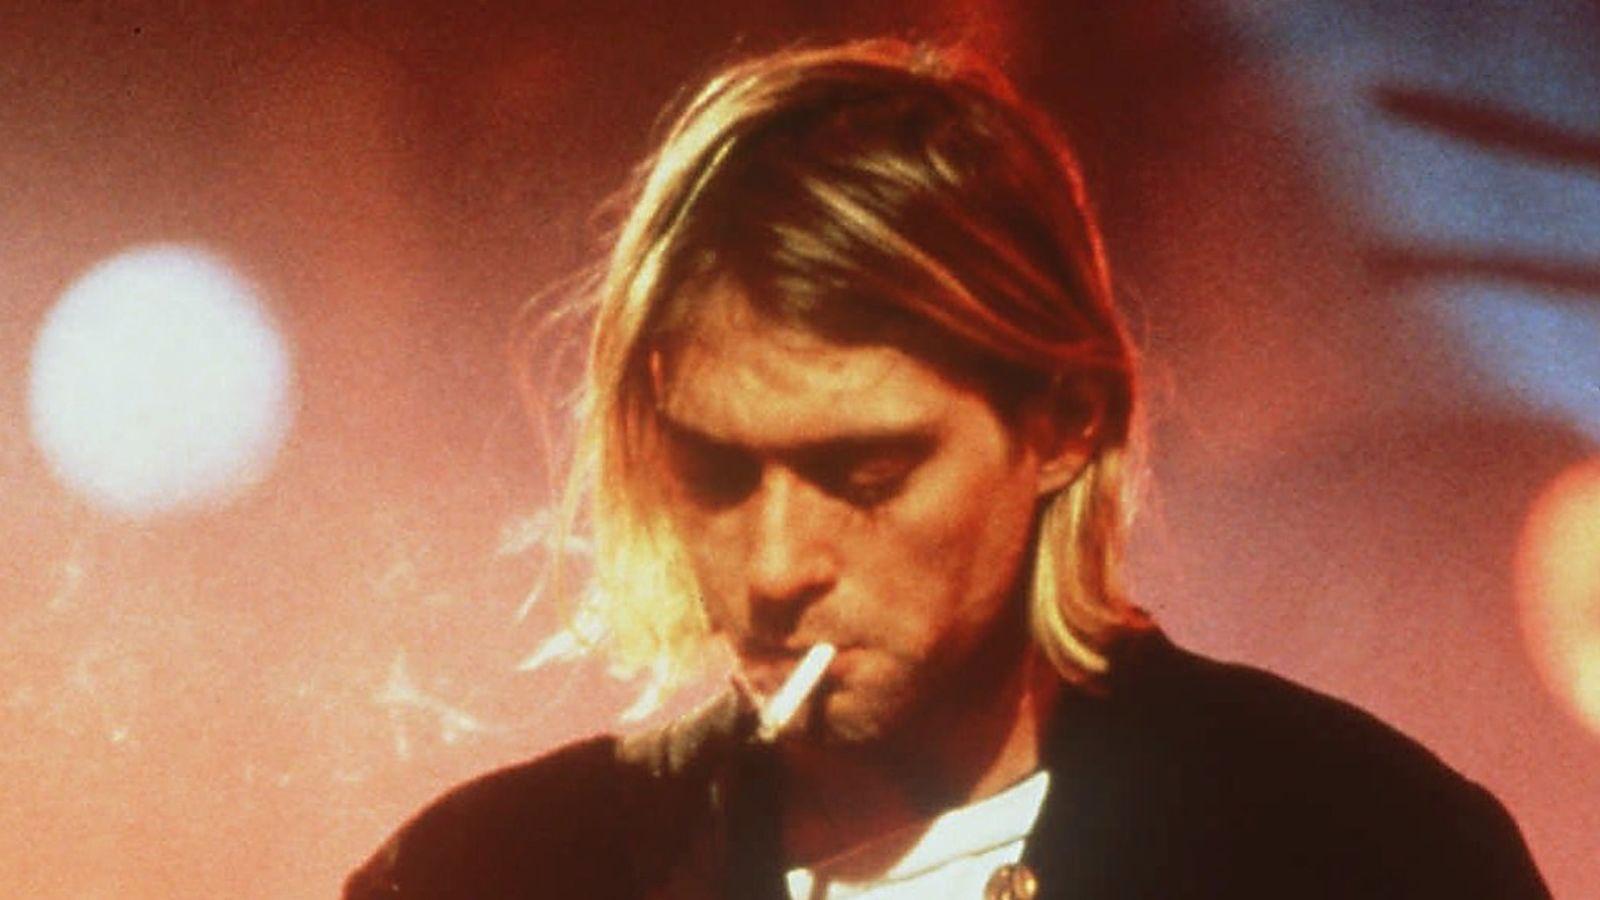 Happy birthday to the legend himself, Kurt Cobain!